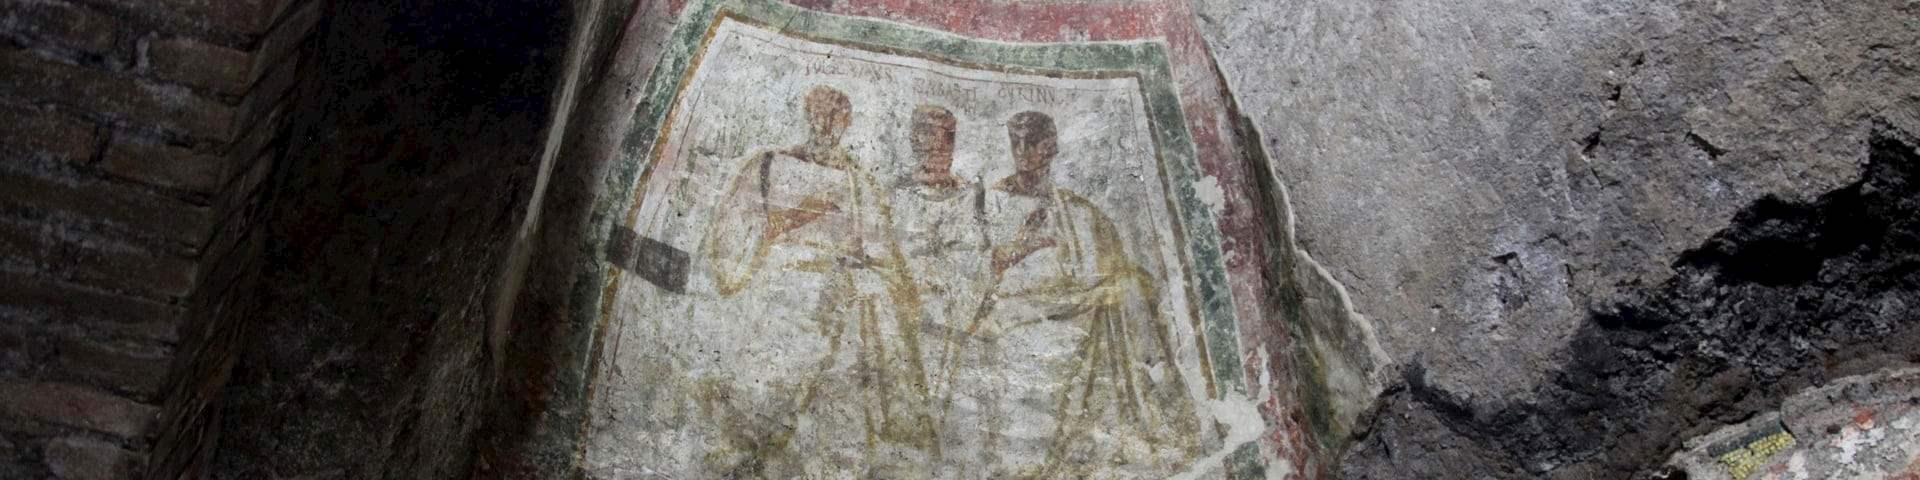 Rome Catacombs Tours